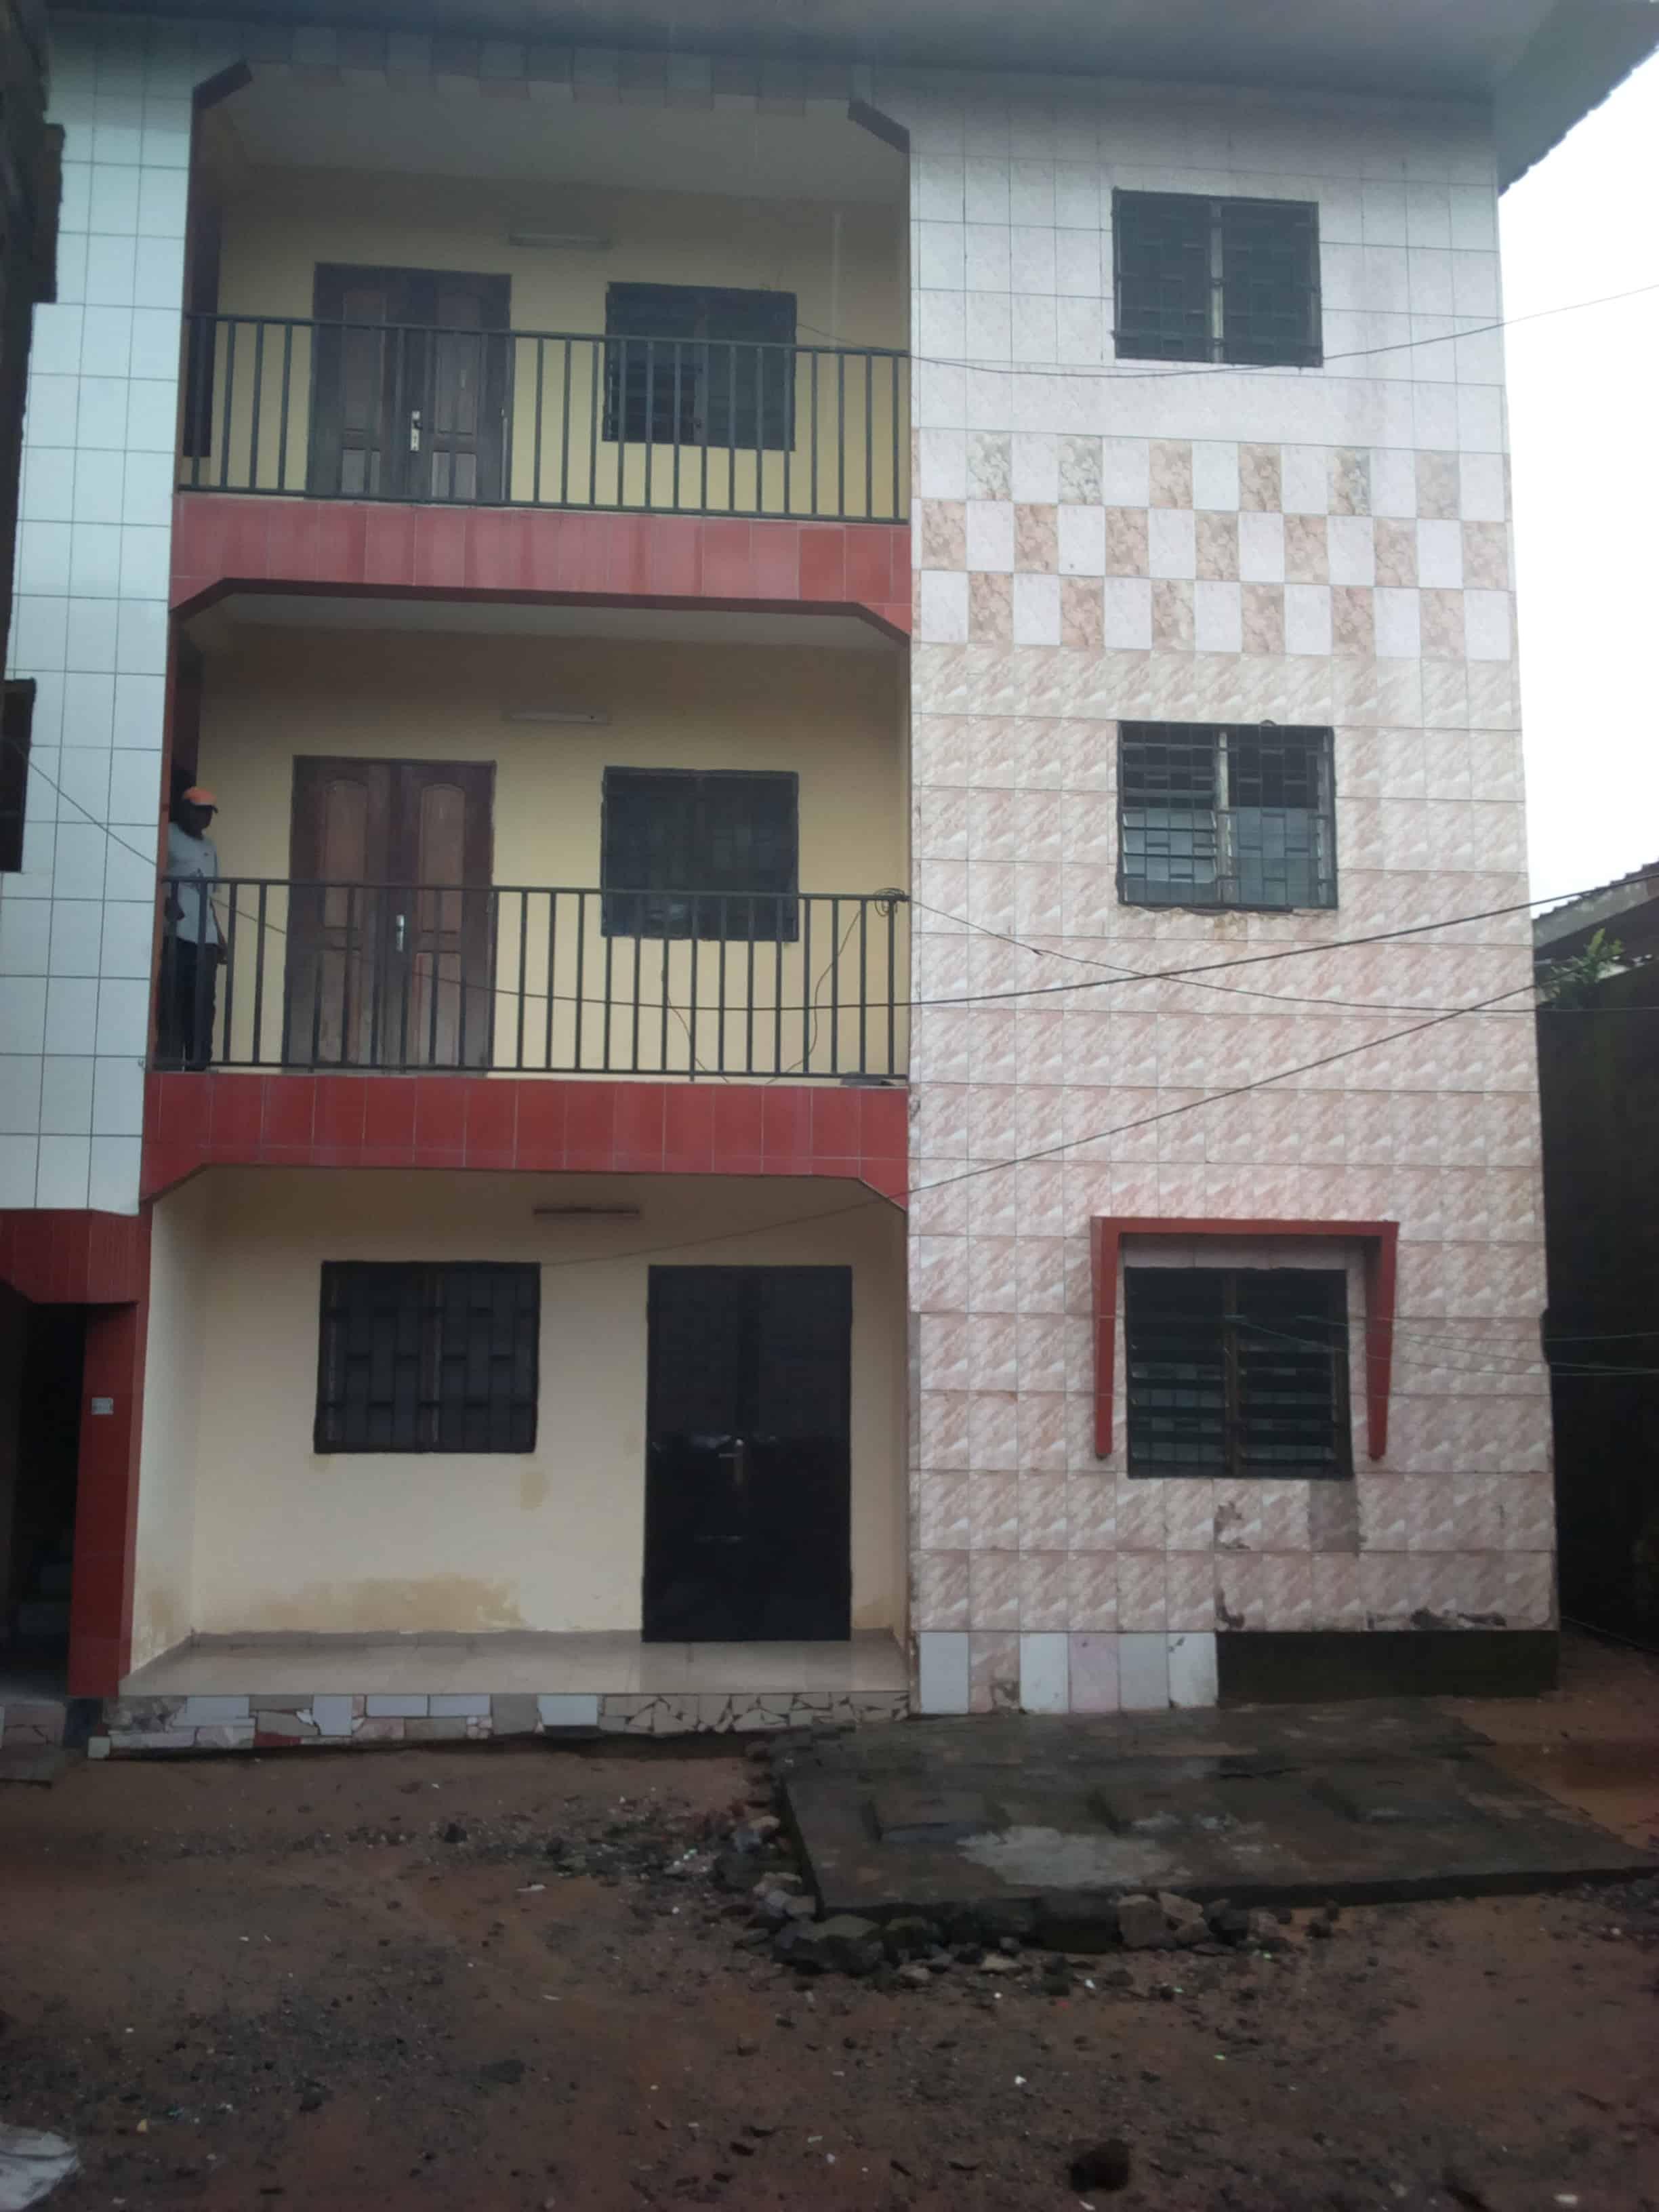 Apartment to rent - Douala, Logpom, Basson - 1 living room(s), 2 bedroom(s), 1 bathroom(s) - 90 000 FCFA / month